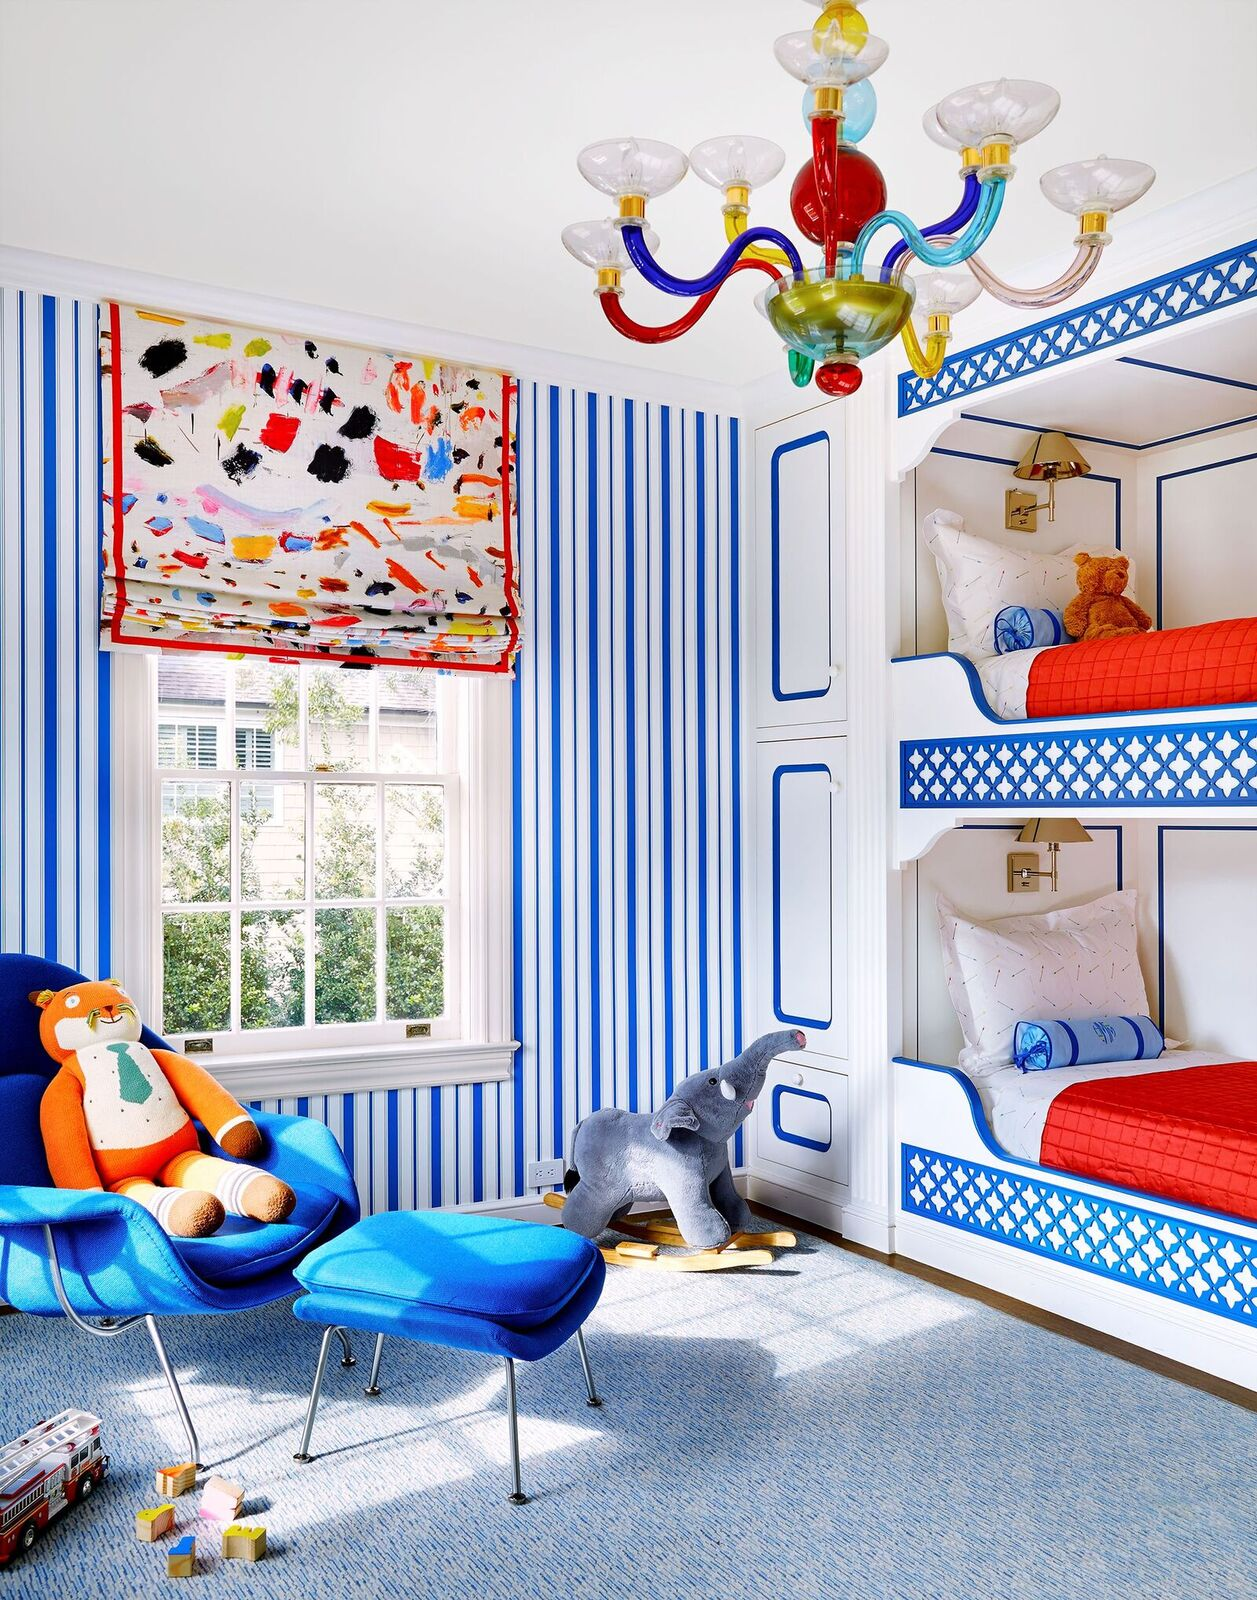 kids-rooms-hbx090117sherwin01-1558467850.jpg